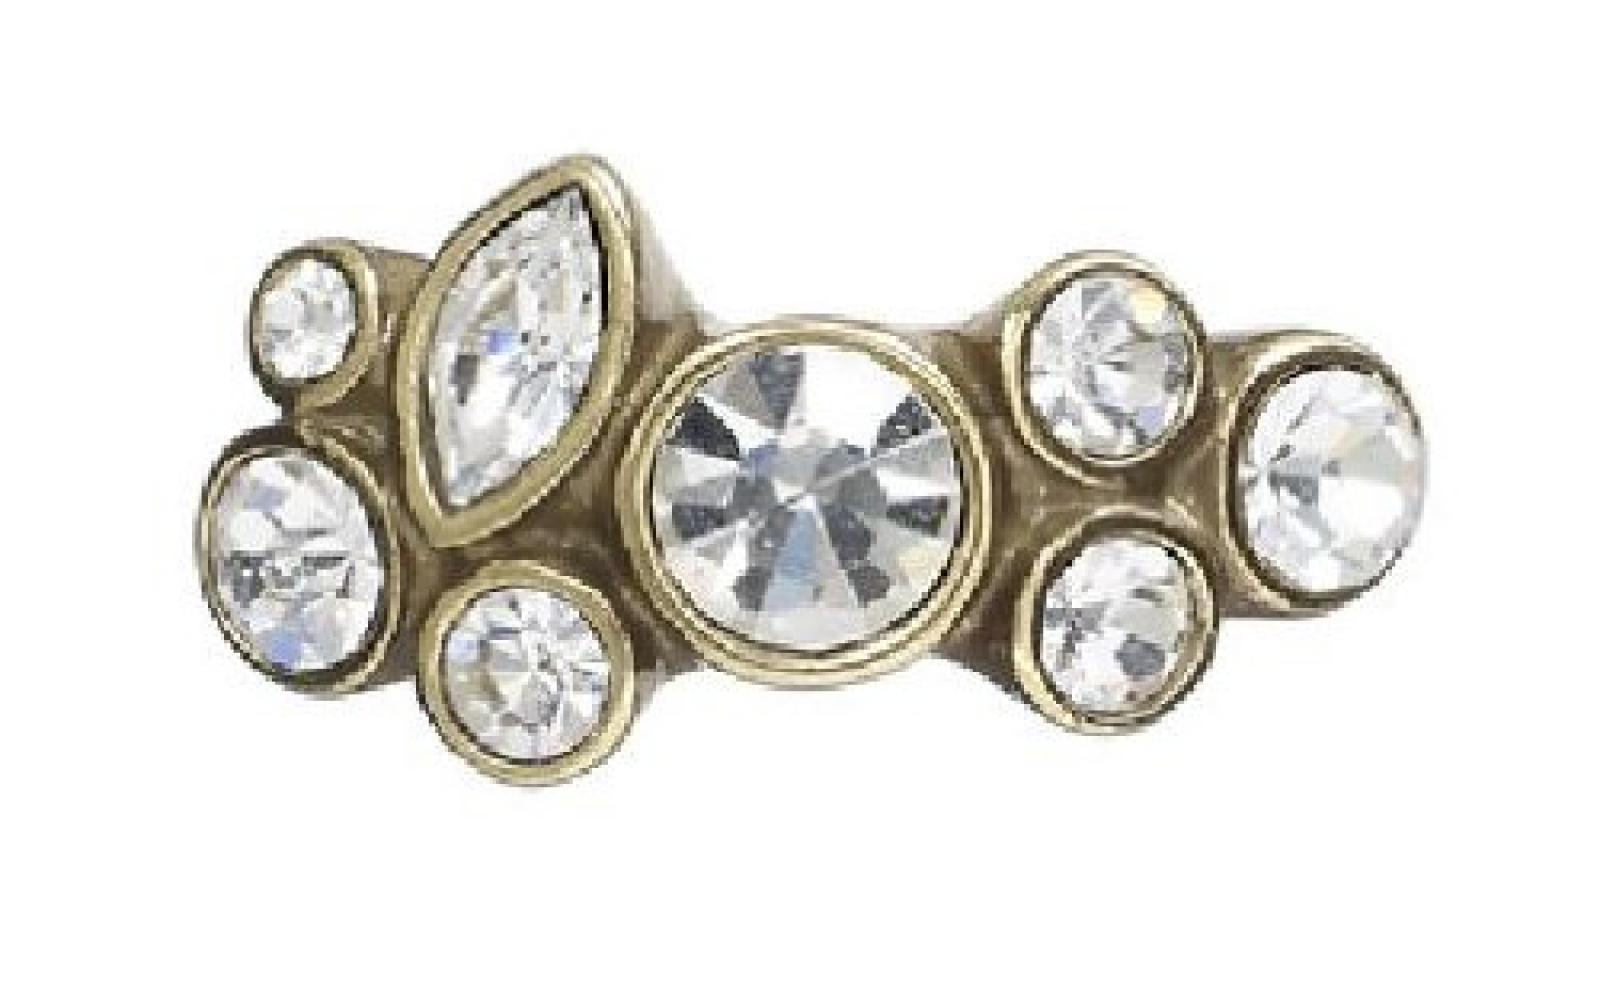 Pilgrim Damen-Ring Classic Vergoldet, Kristall größenverstellbar 652-904